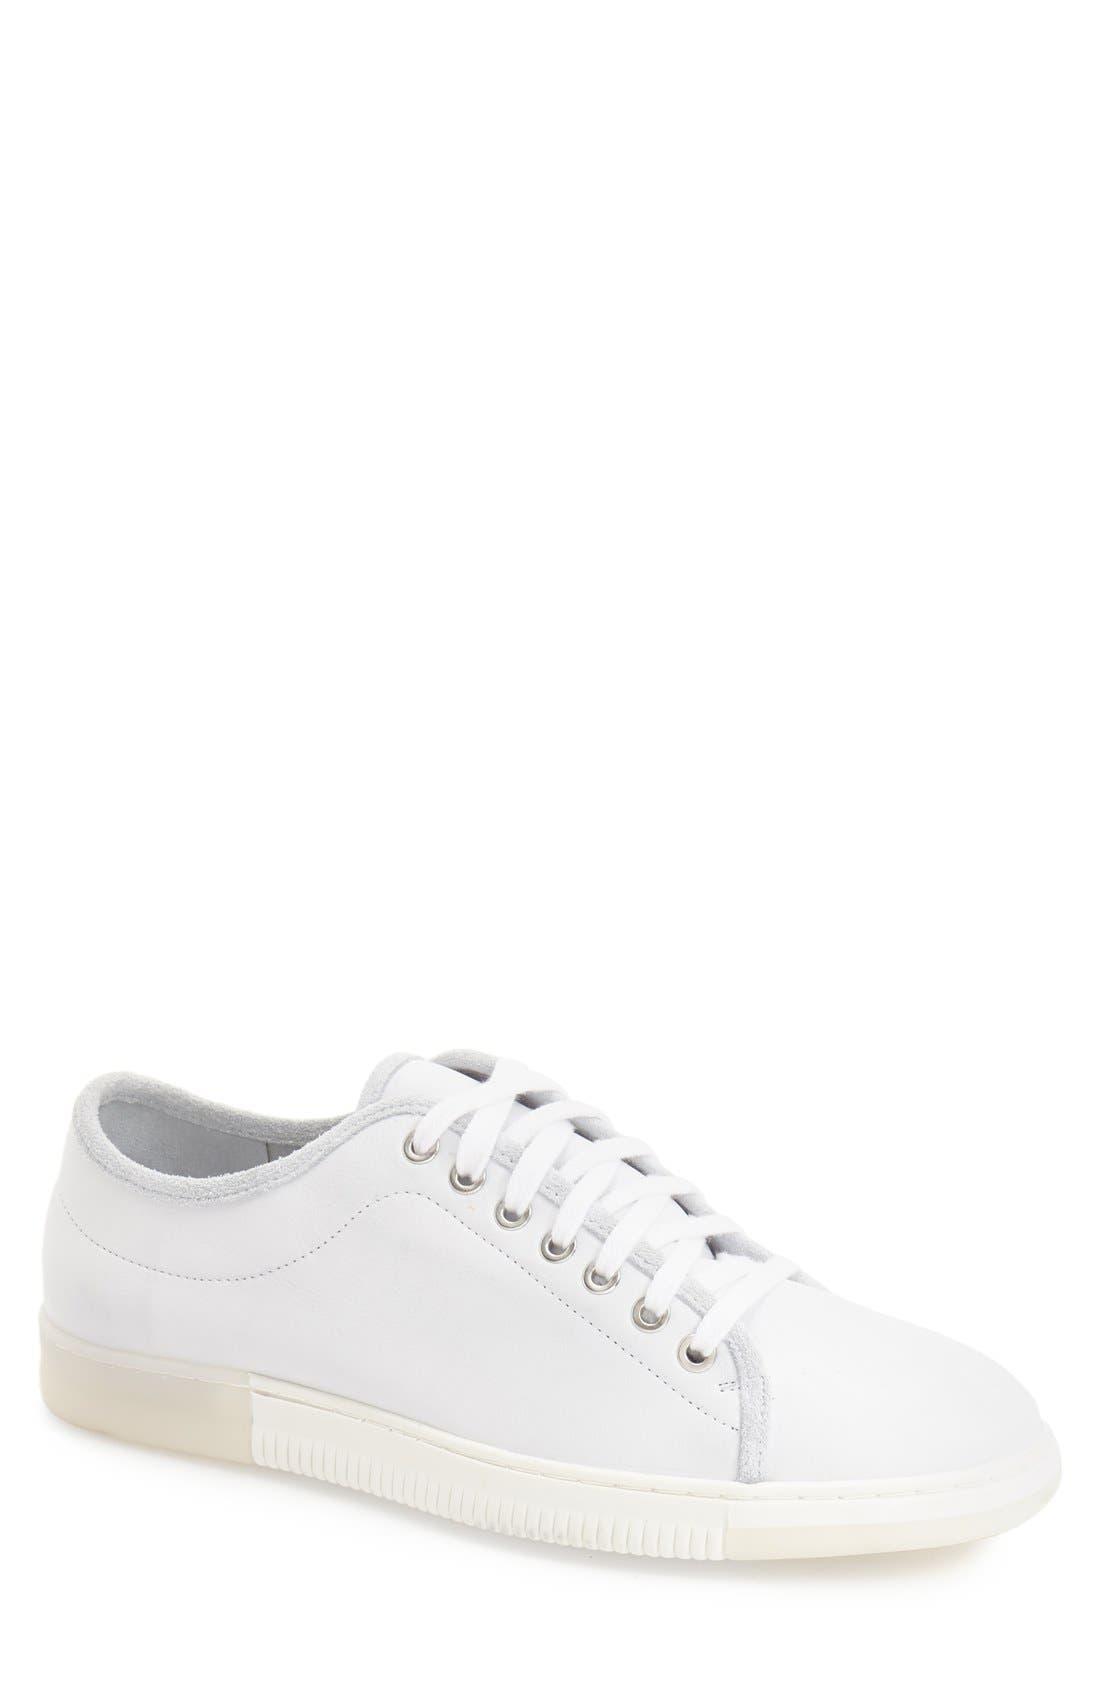 'Justen' Sneaker,                             Main thumbnail 1, color,                             White